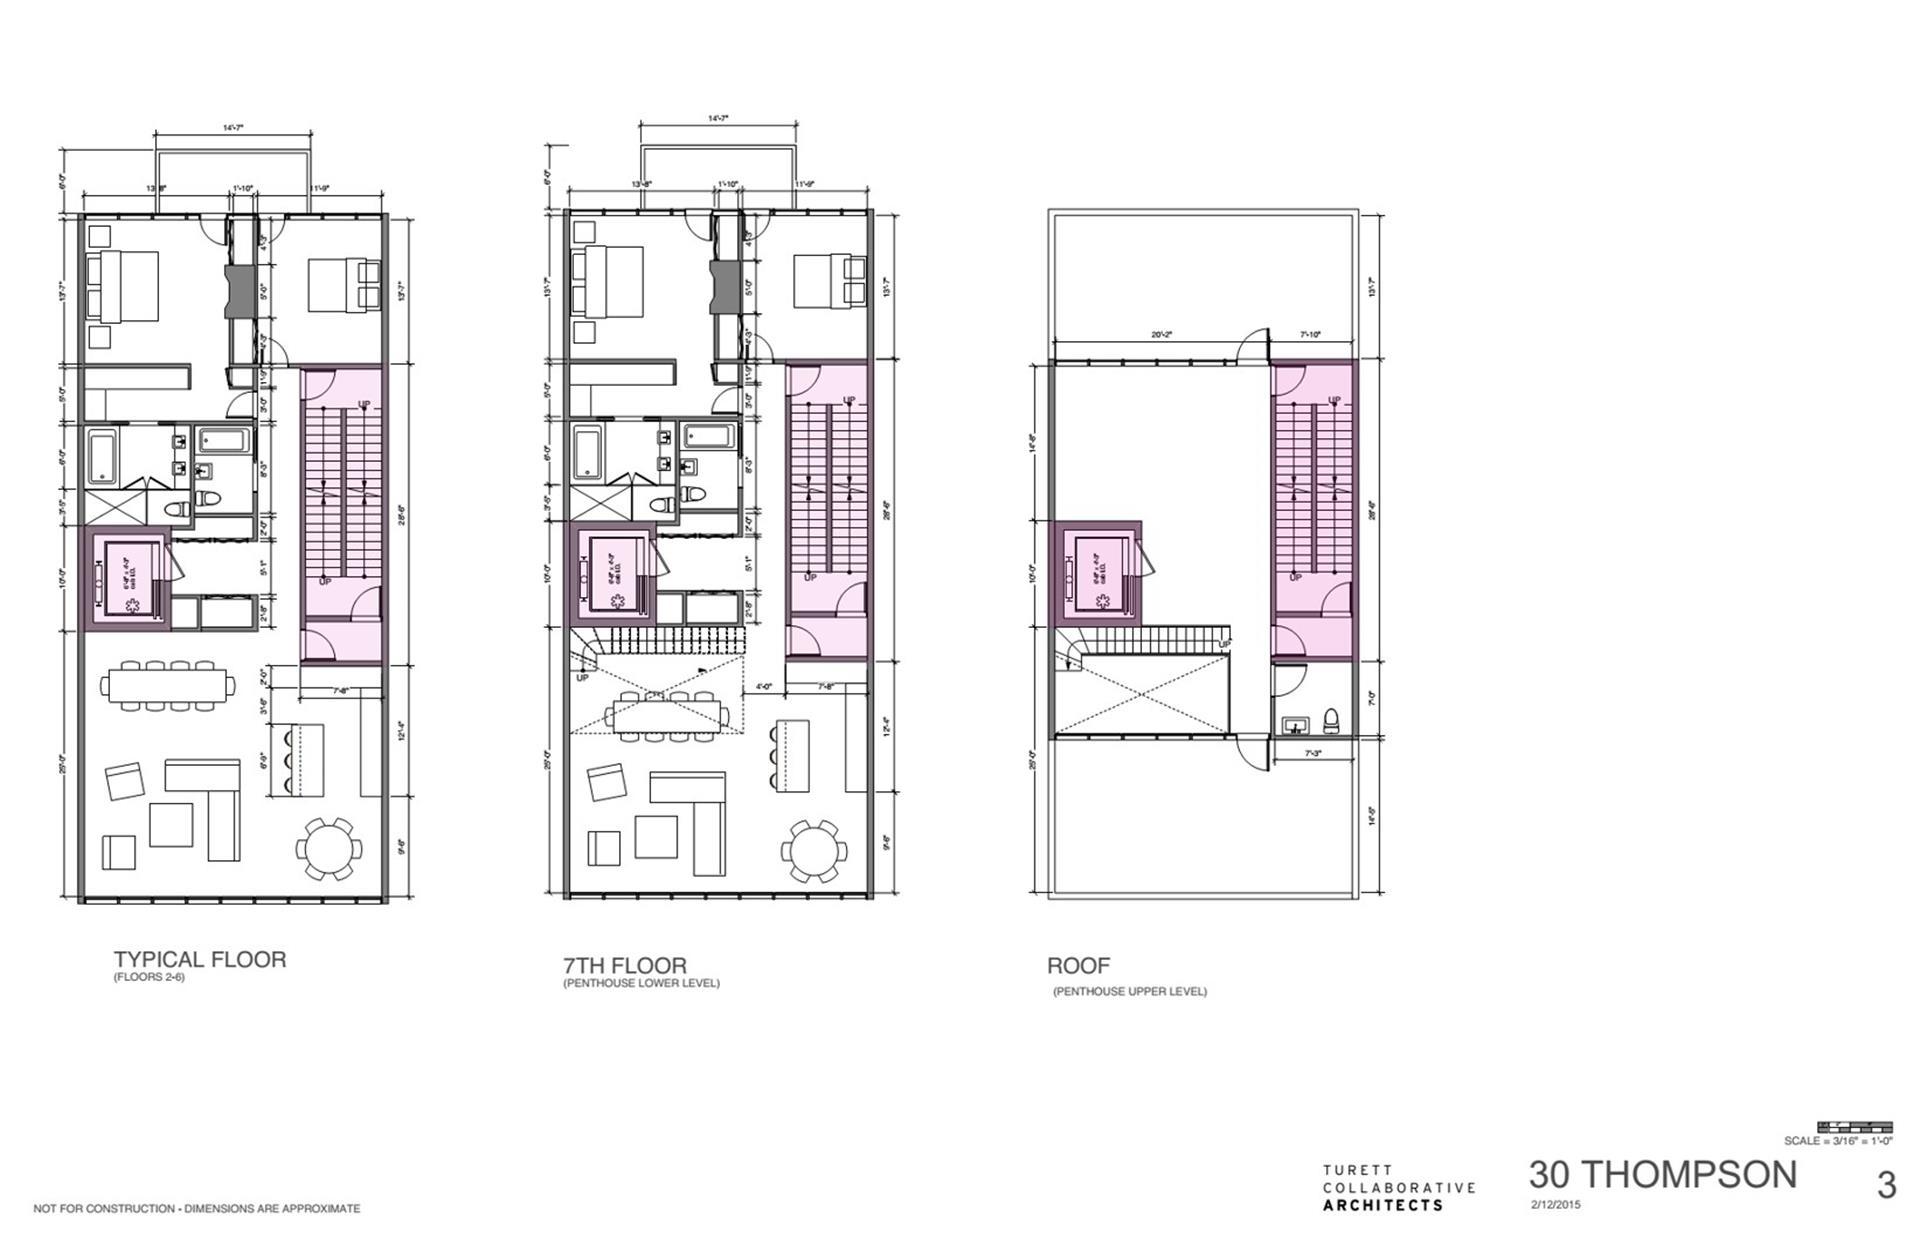 Floor plan of 30 Thompson St - SoHo - Nolita, New York